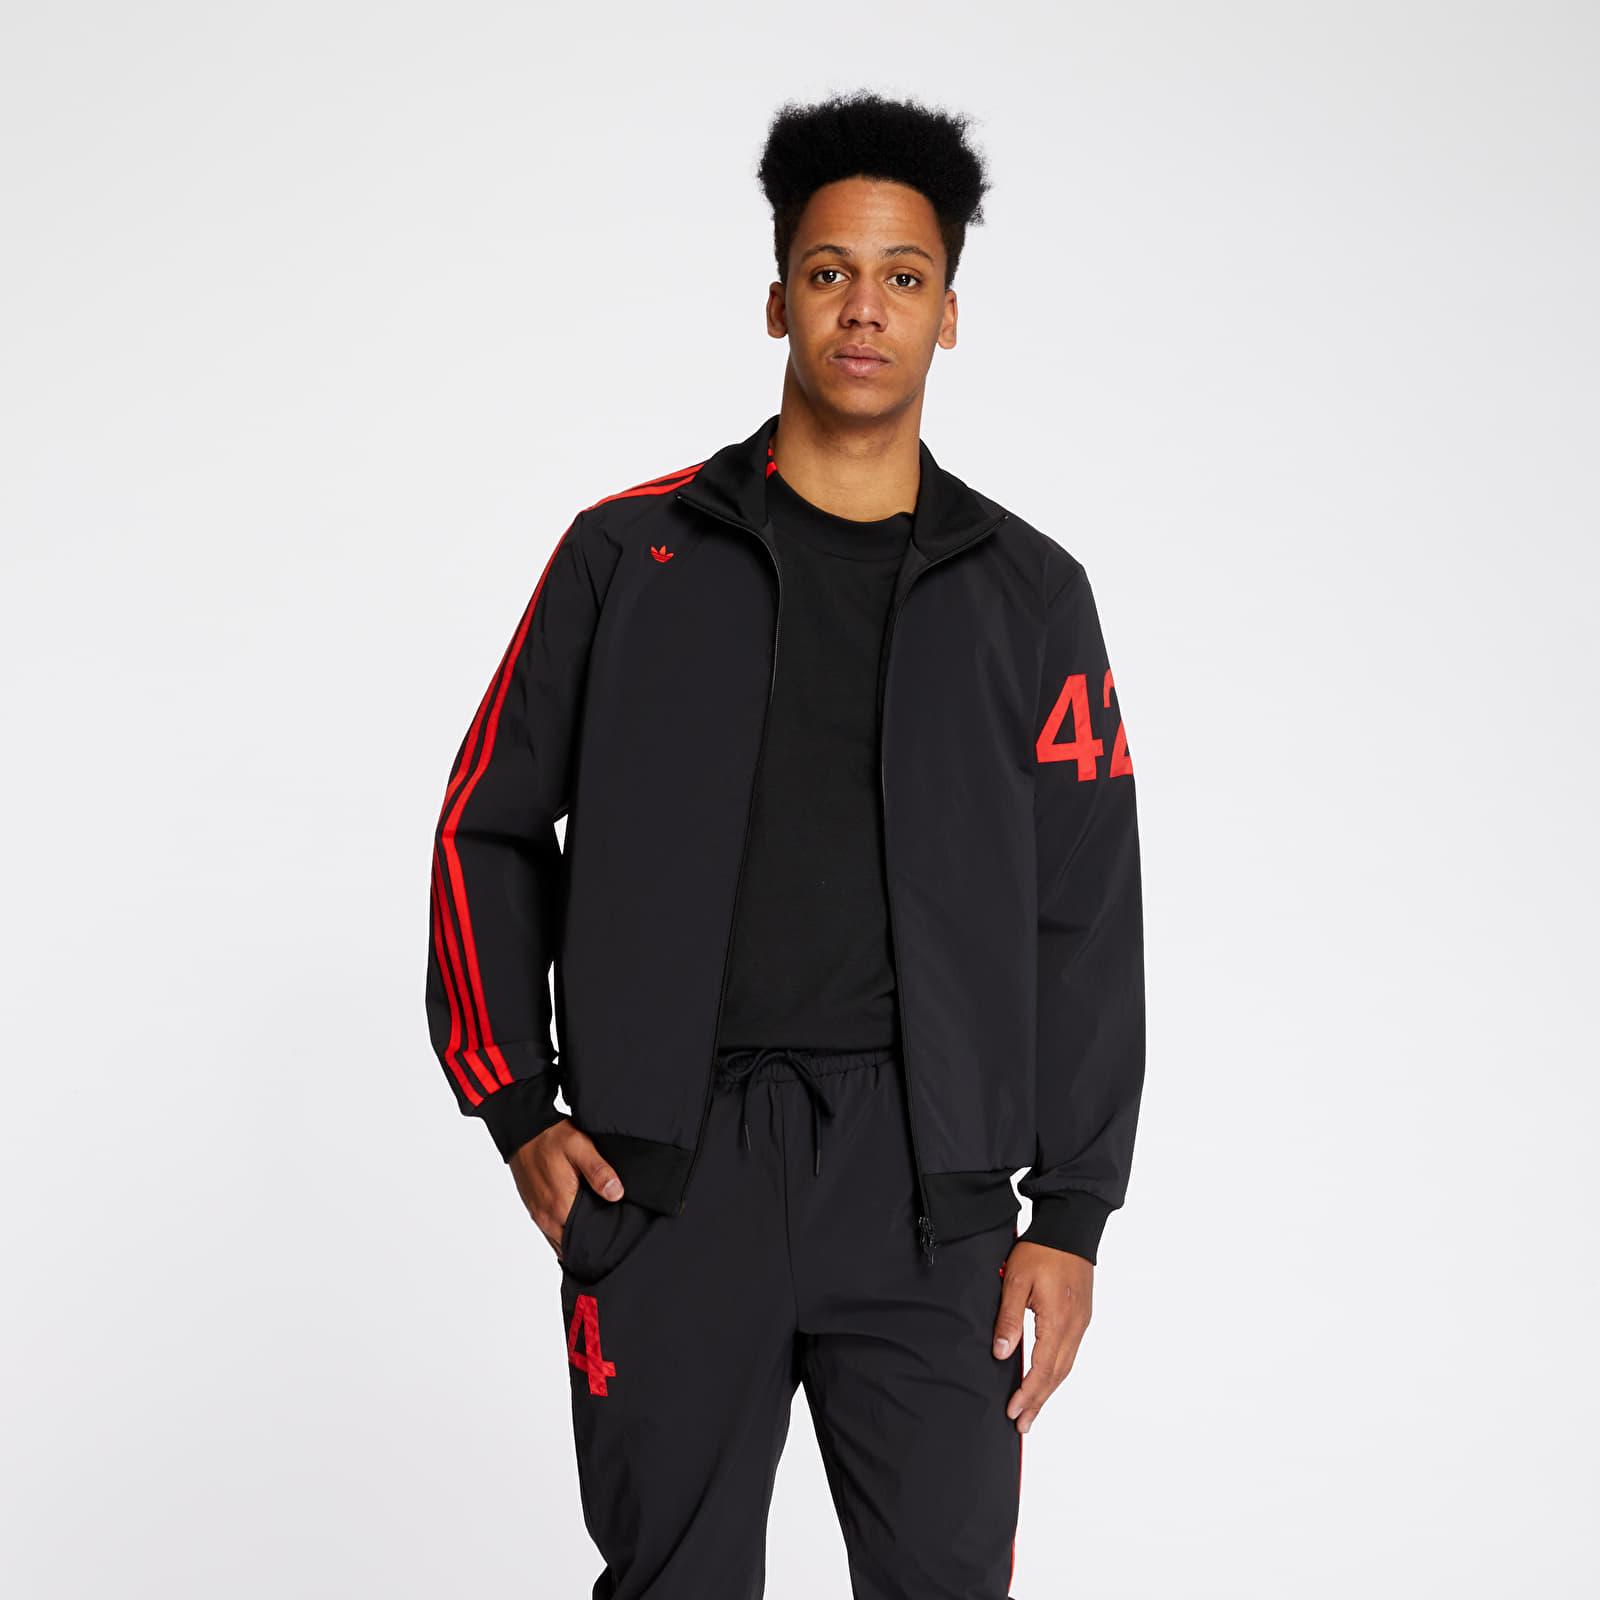 Sweatshirts adidas x 424 Track Top Black